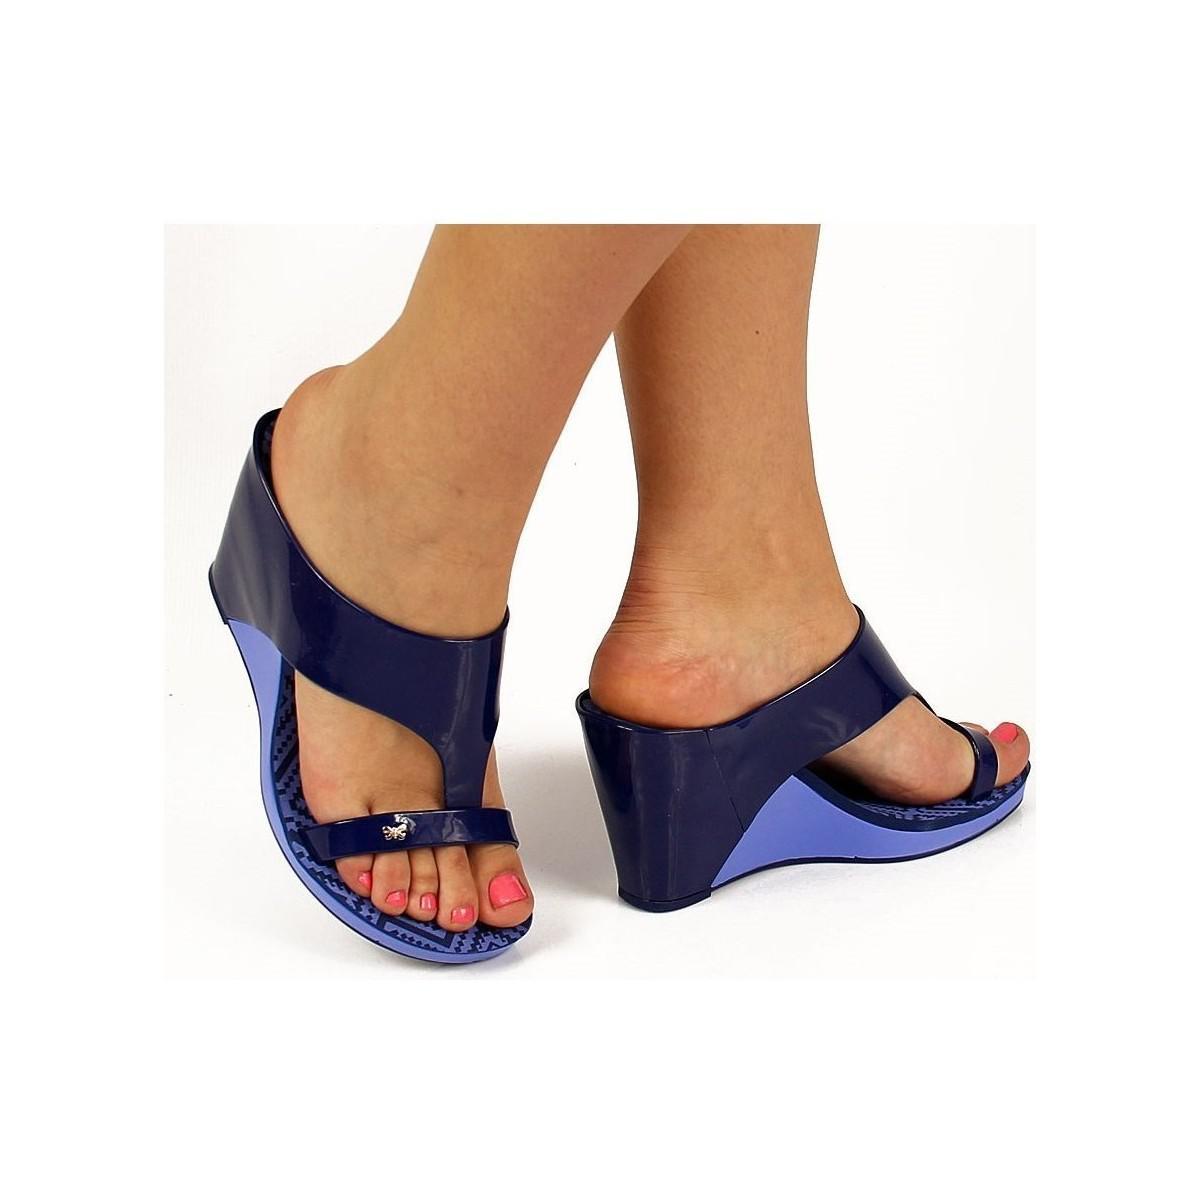 0610e935ba Zaxy Glamour Top Ii Fem 81976 Women's Flip Flops / Sandals (shoes ...